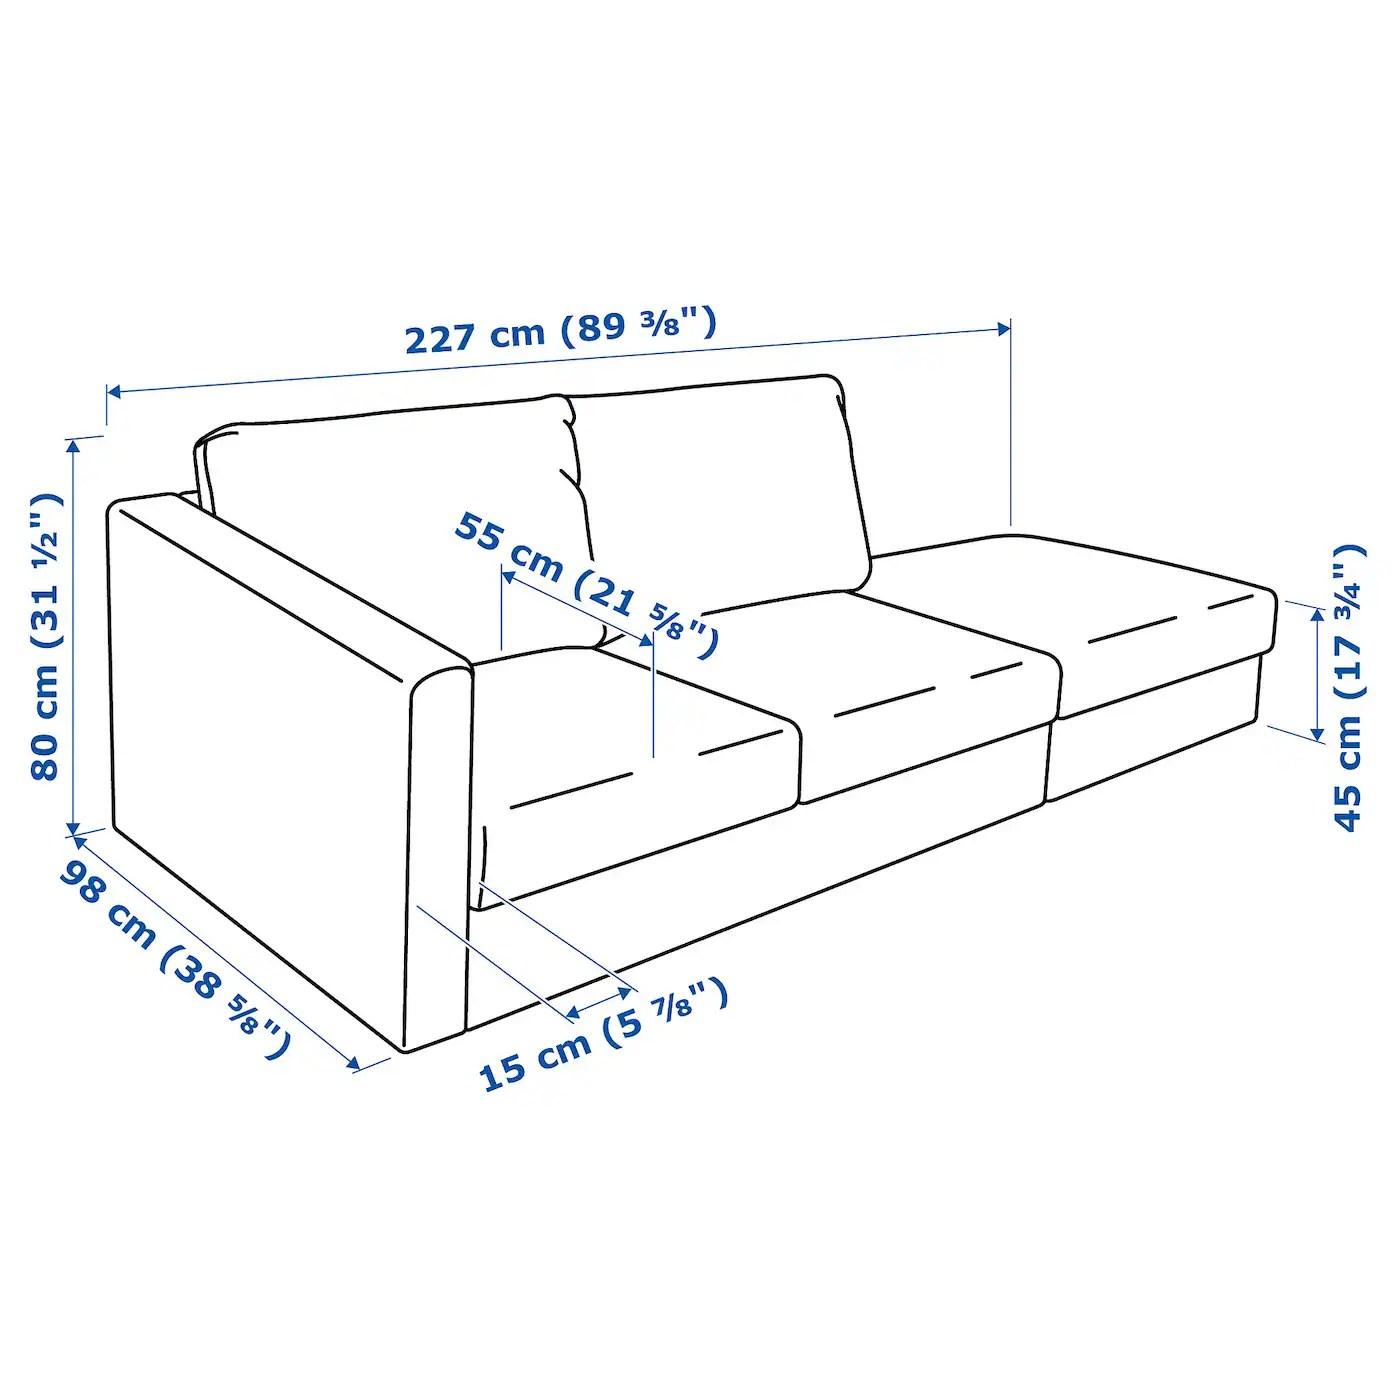 Vimle 3 Seat Sofa With Open End Farsta Dark Brown